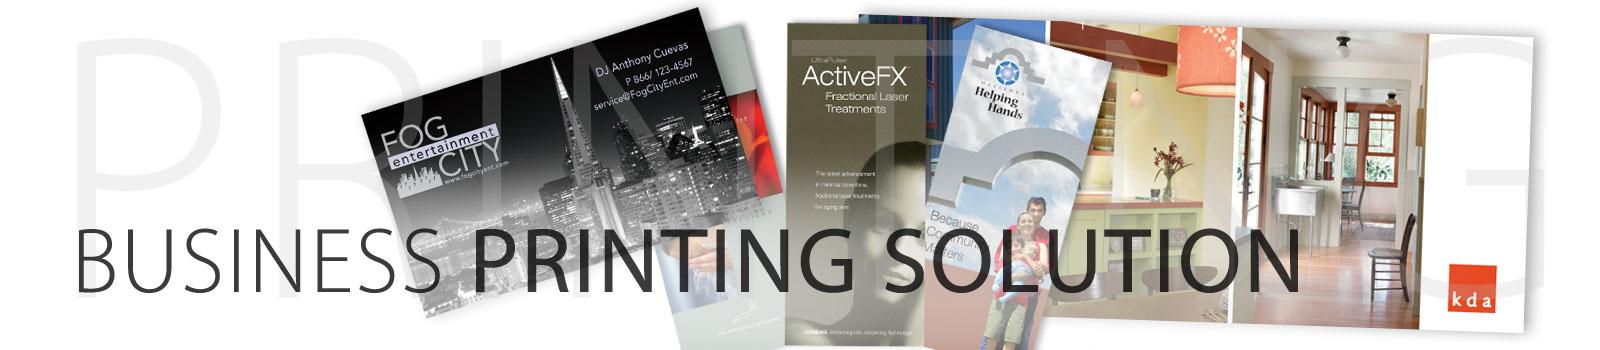 L&D-printing-header_Business